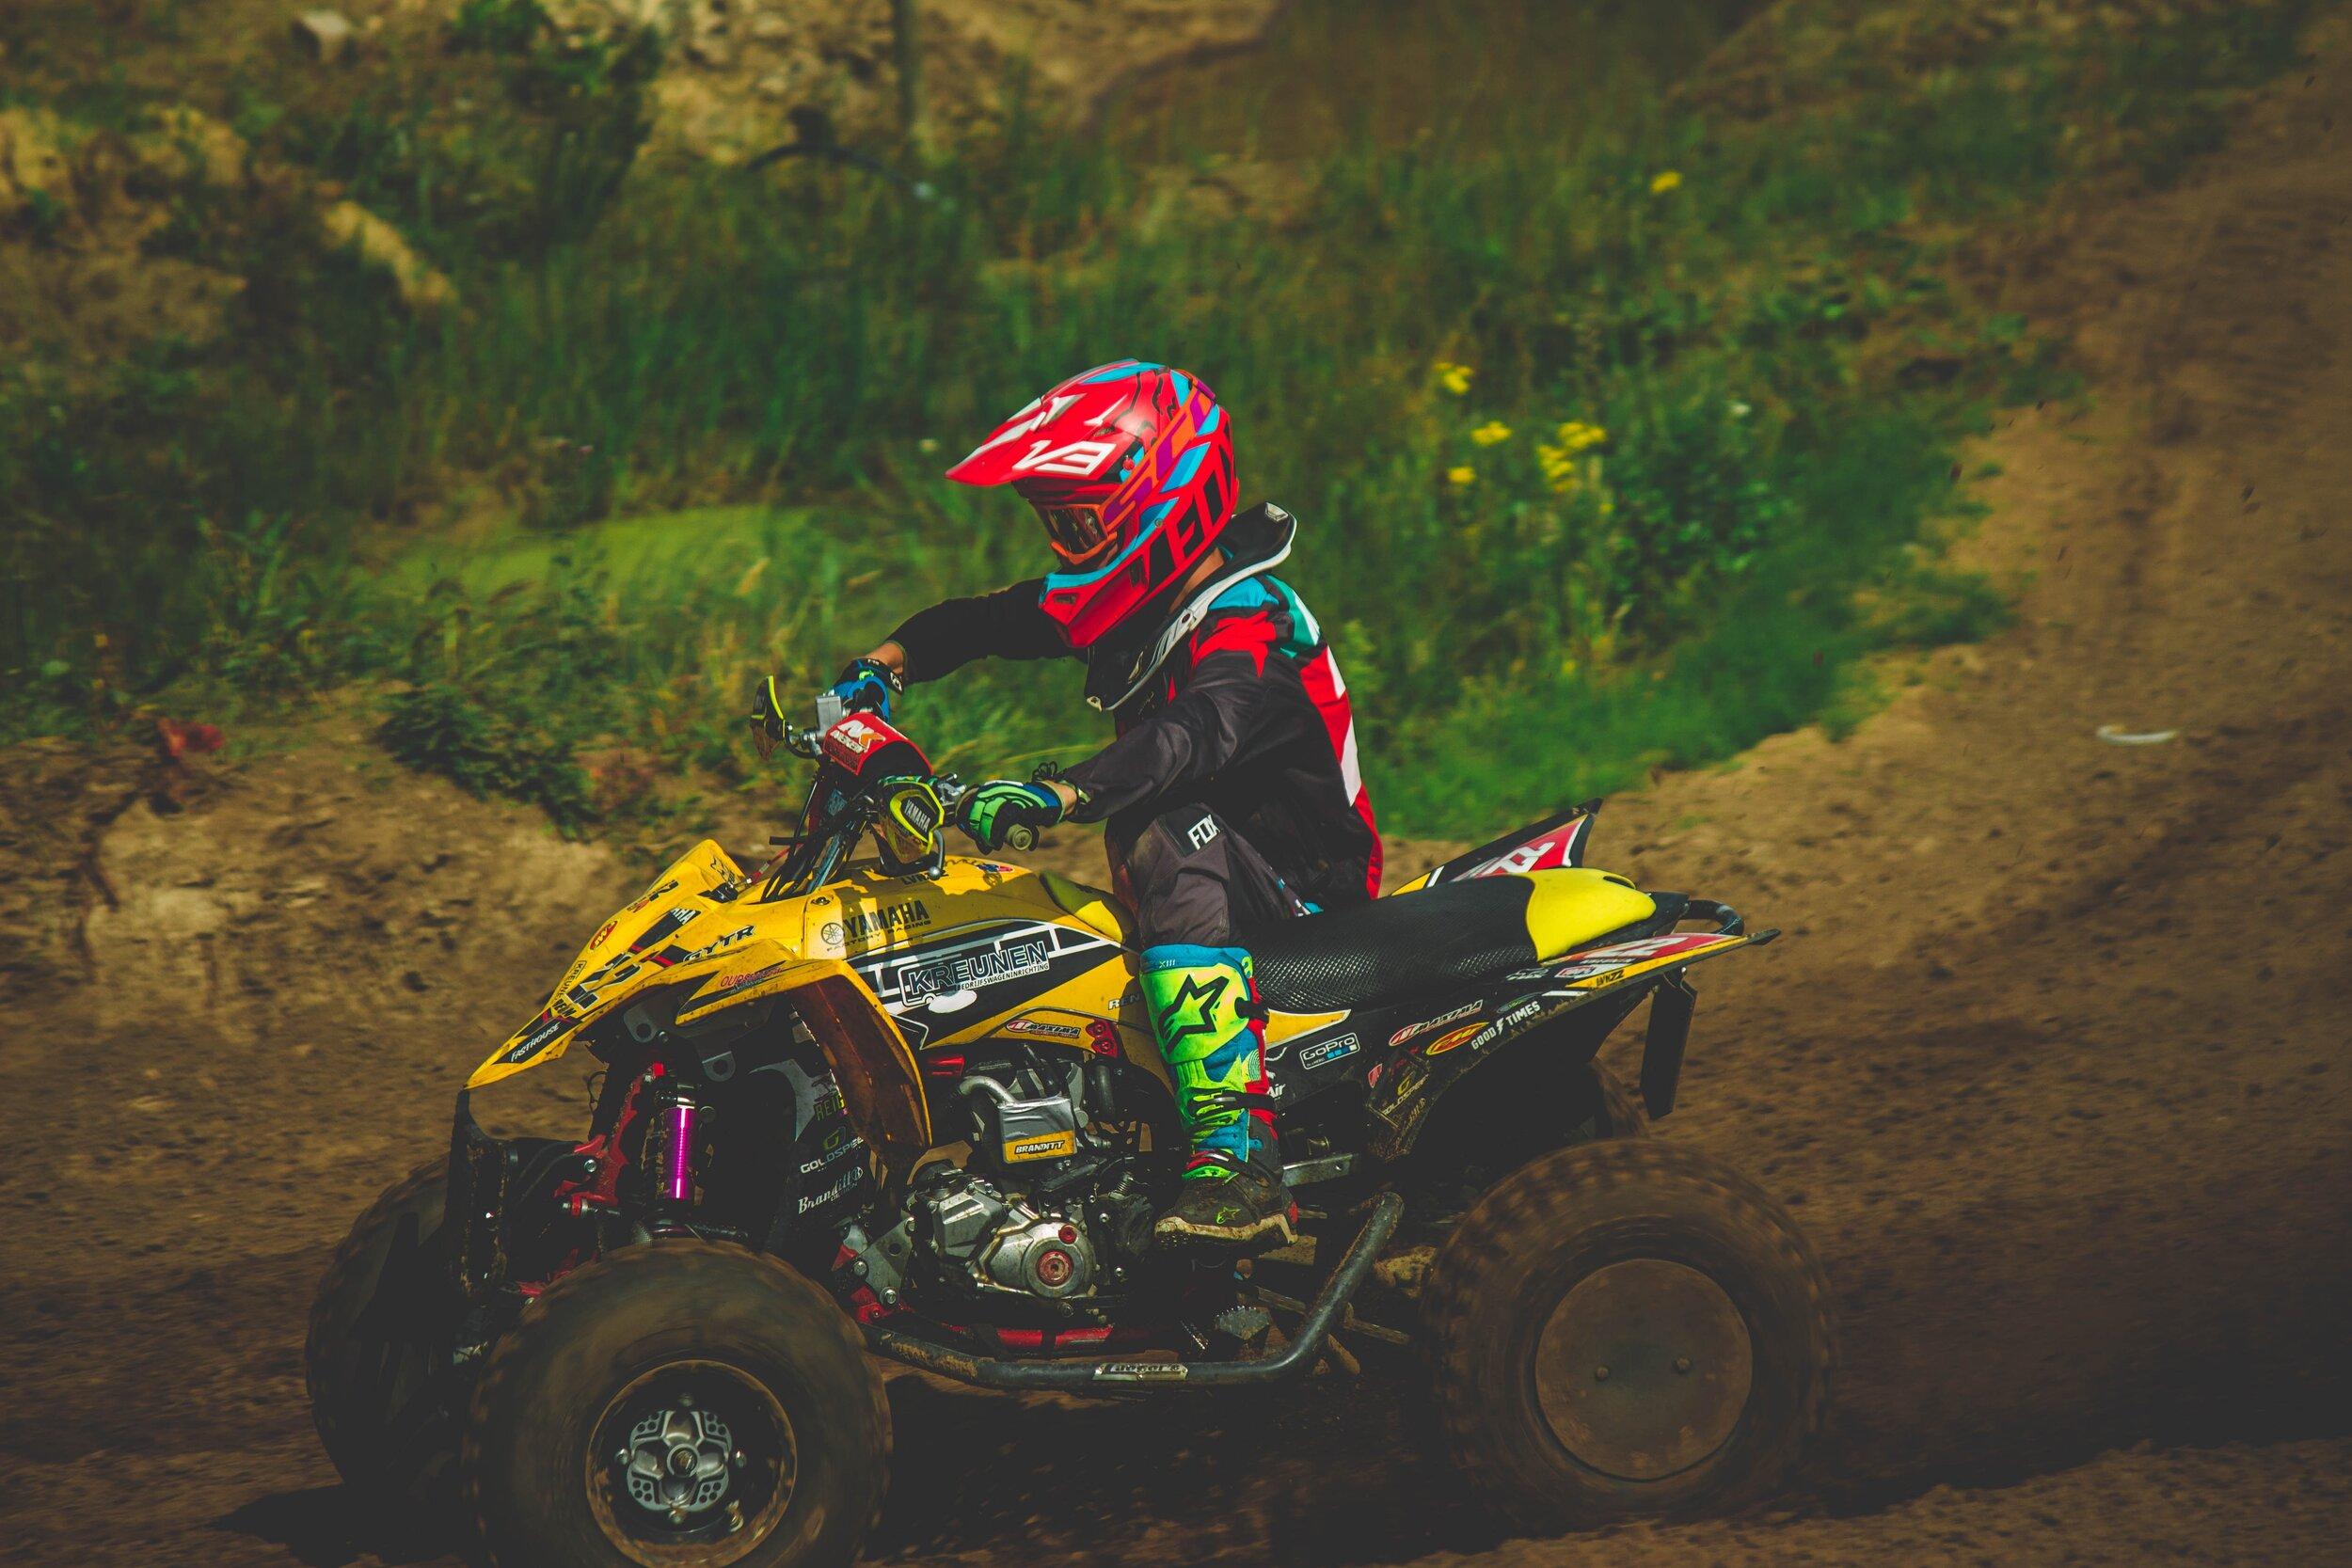 ATV Tomahawk Trail